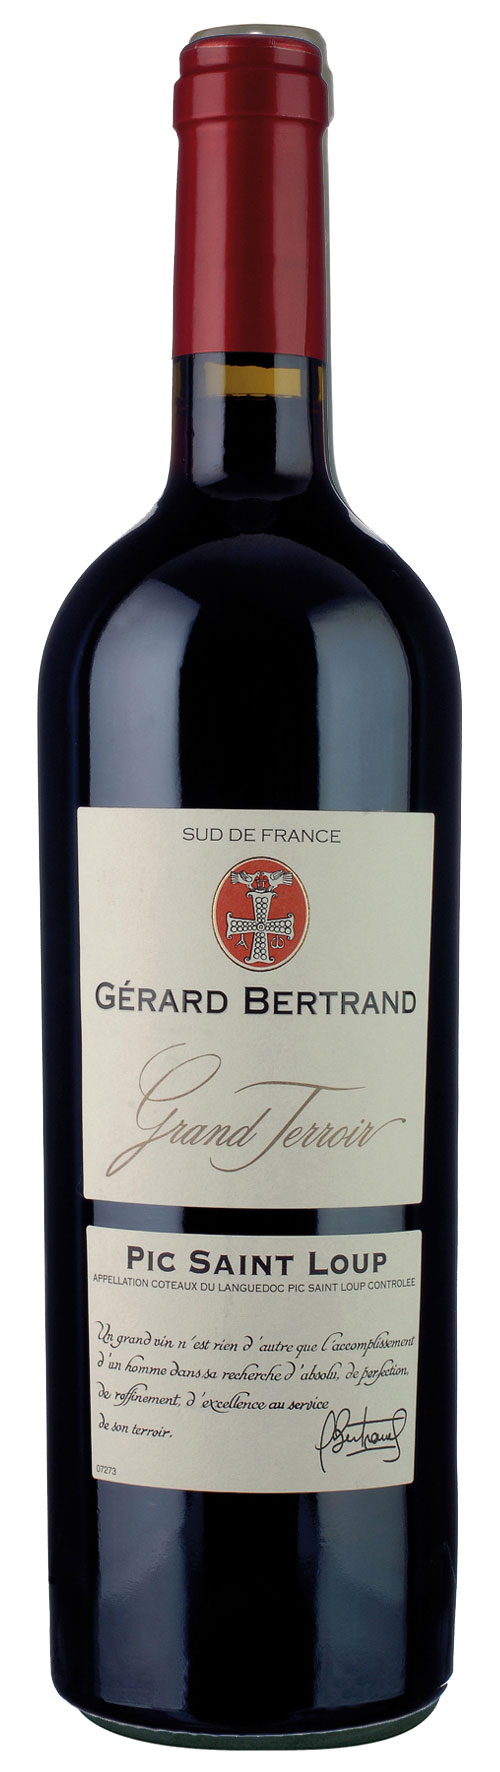 Gerard Bertrand Pic Saint Loup Grand Terroir 2018